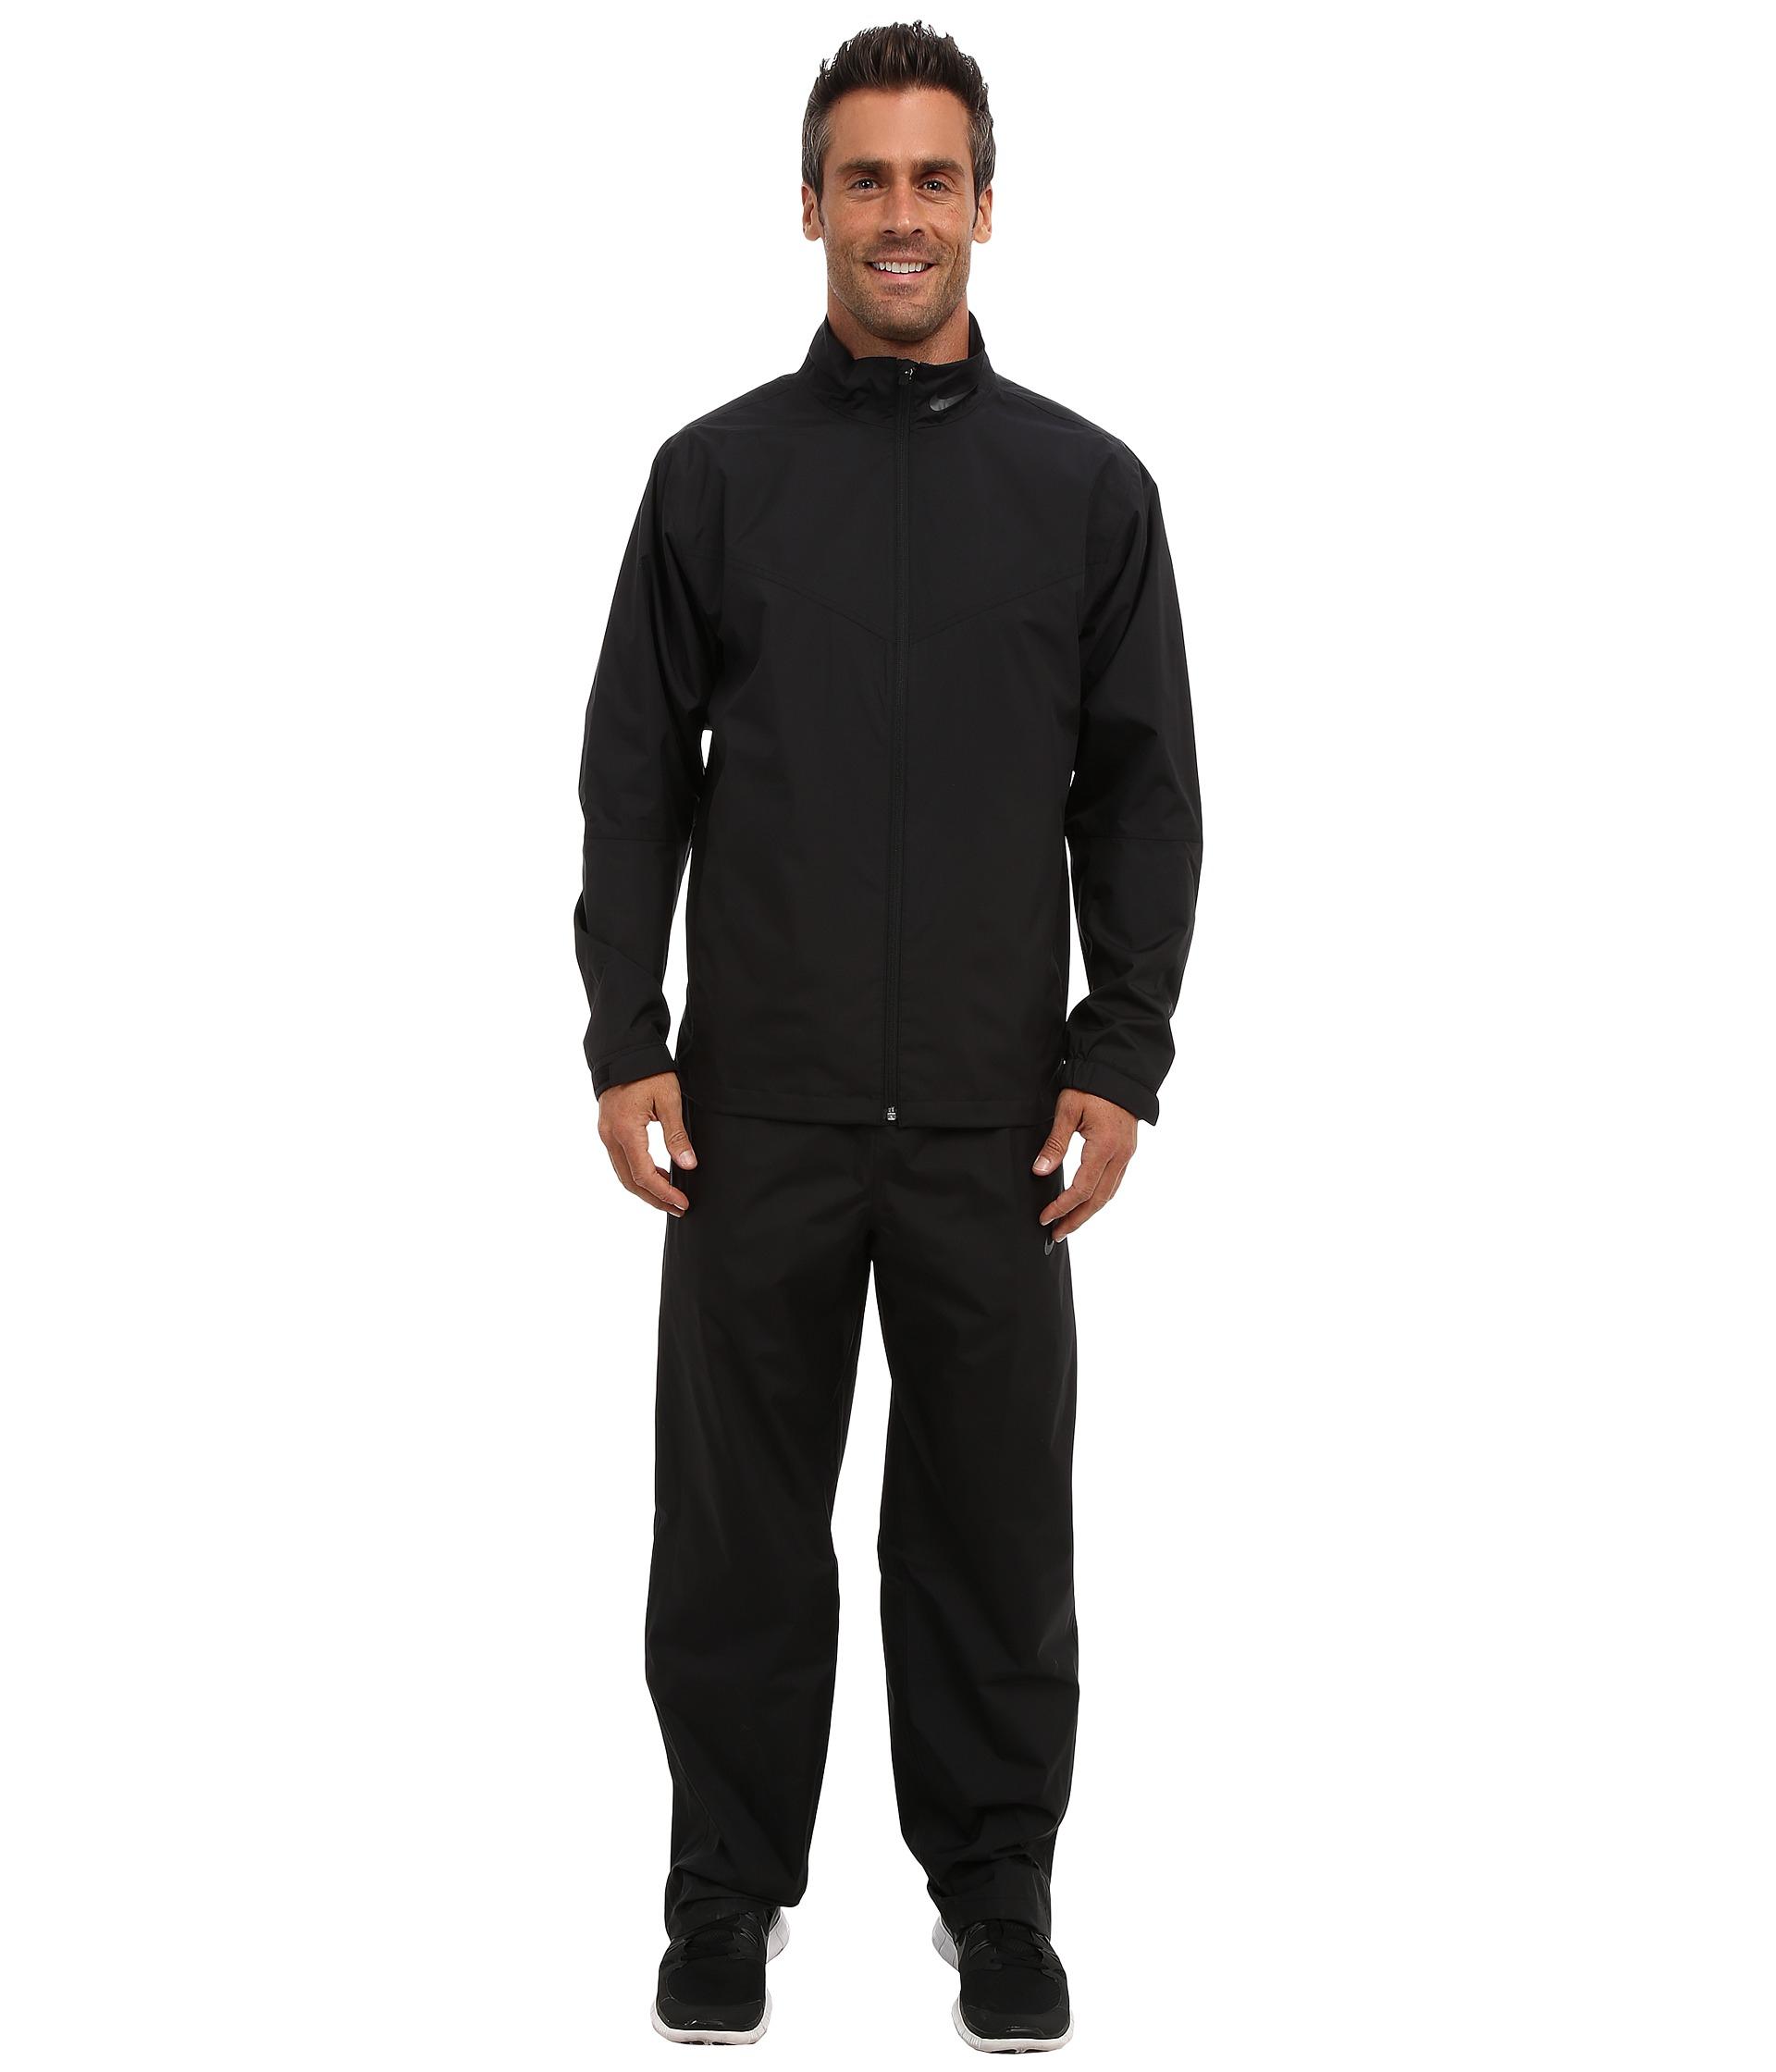 Lyst - Nike New Storm-fit Rain Suit in Black for Men ba177ec431e9